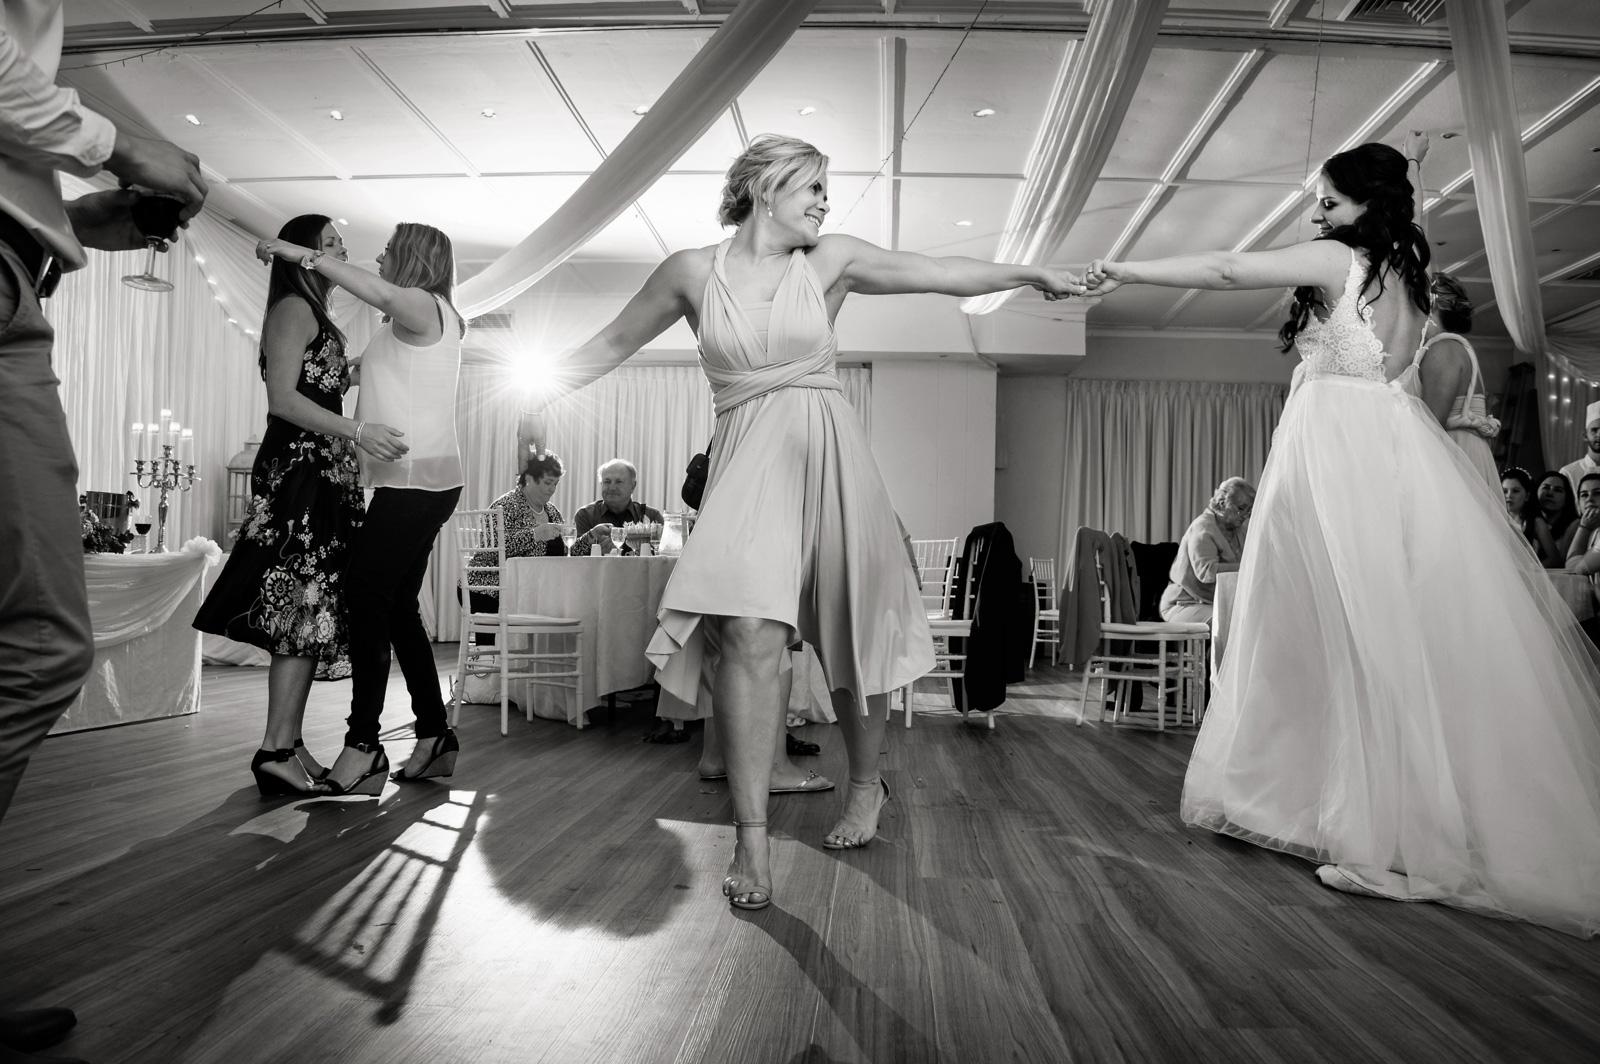 girls dance at wedding